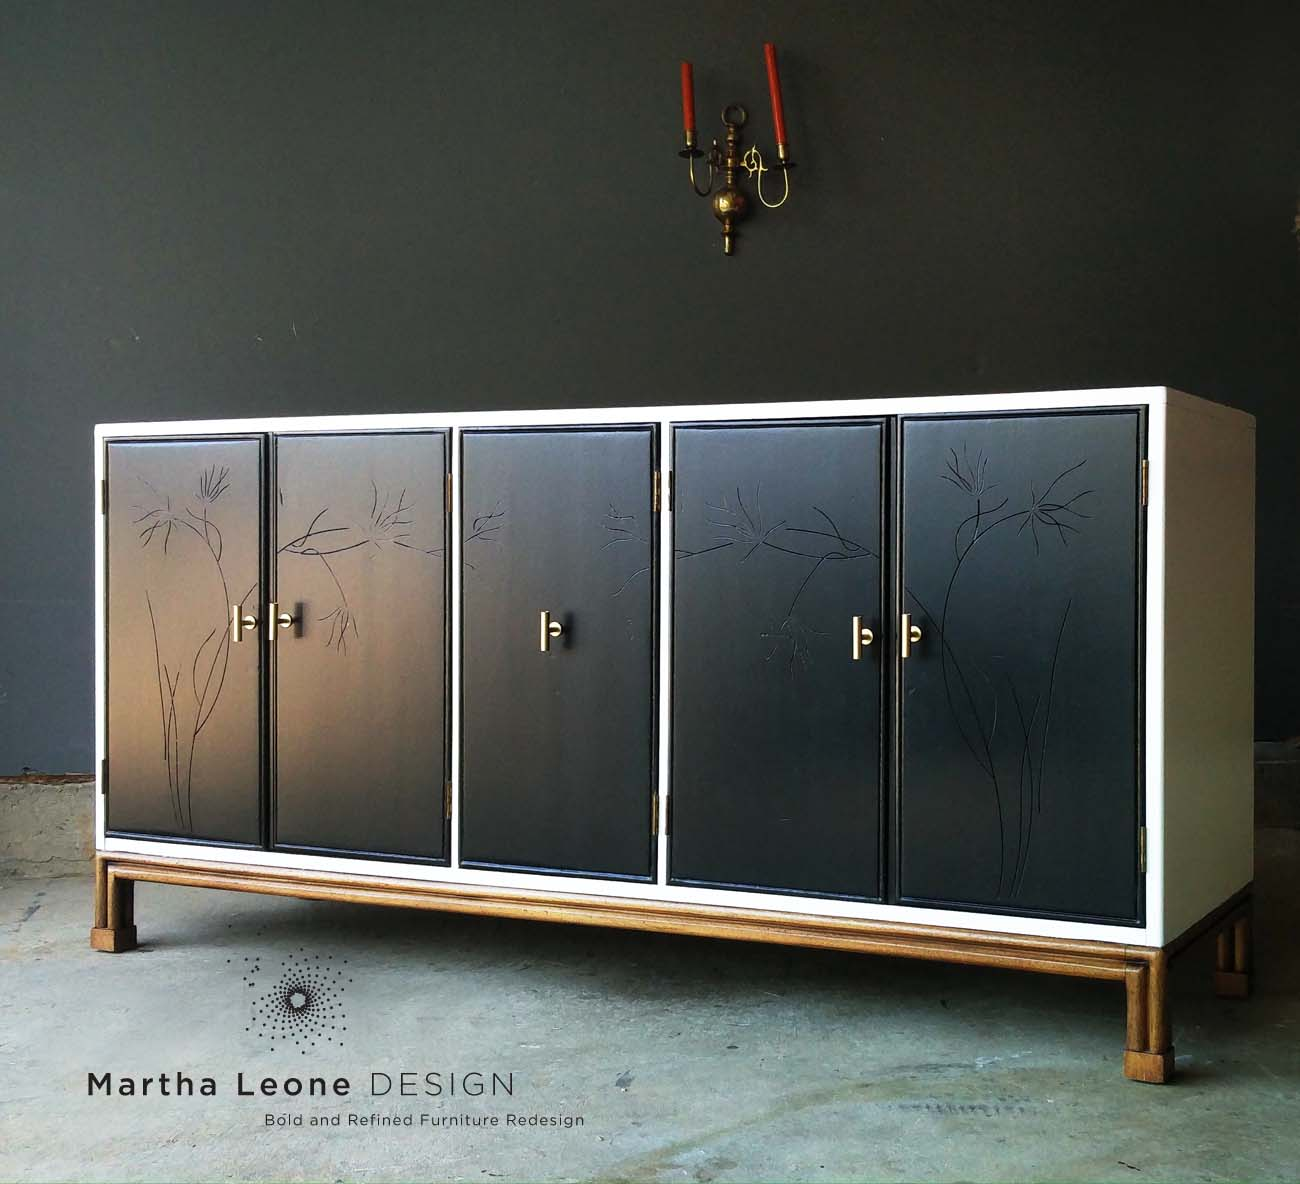 CredenzaA Martha Leone Design.jpg